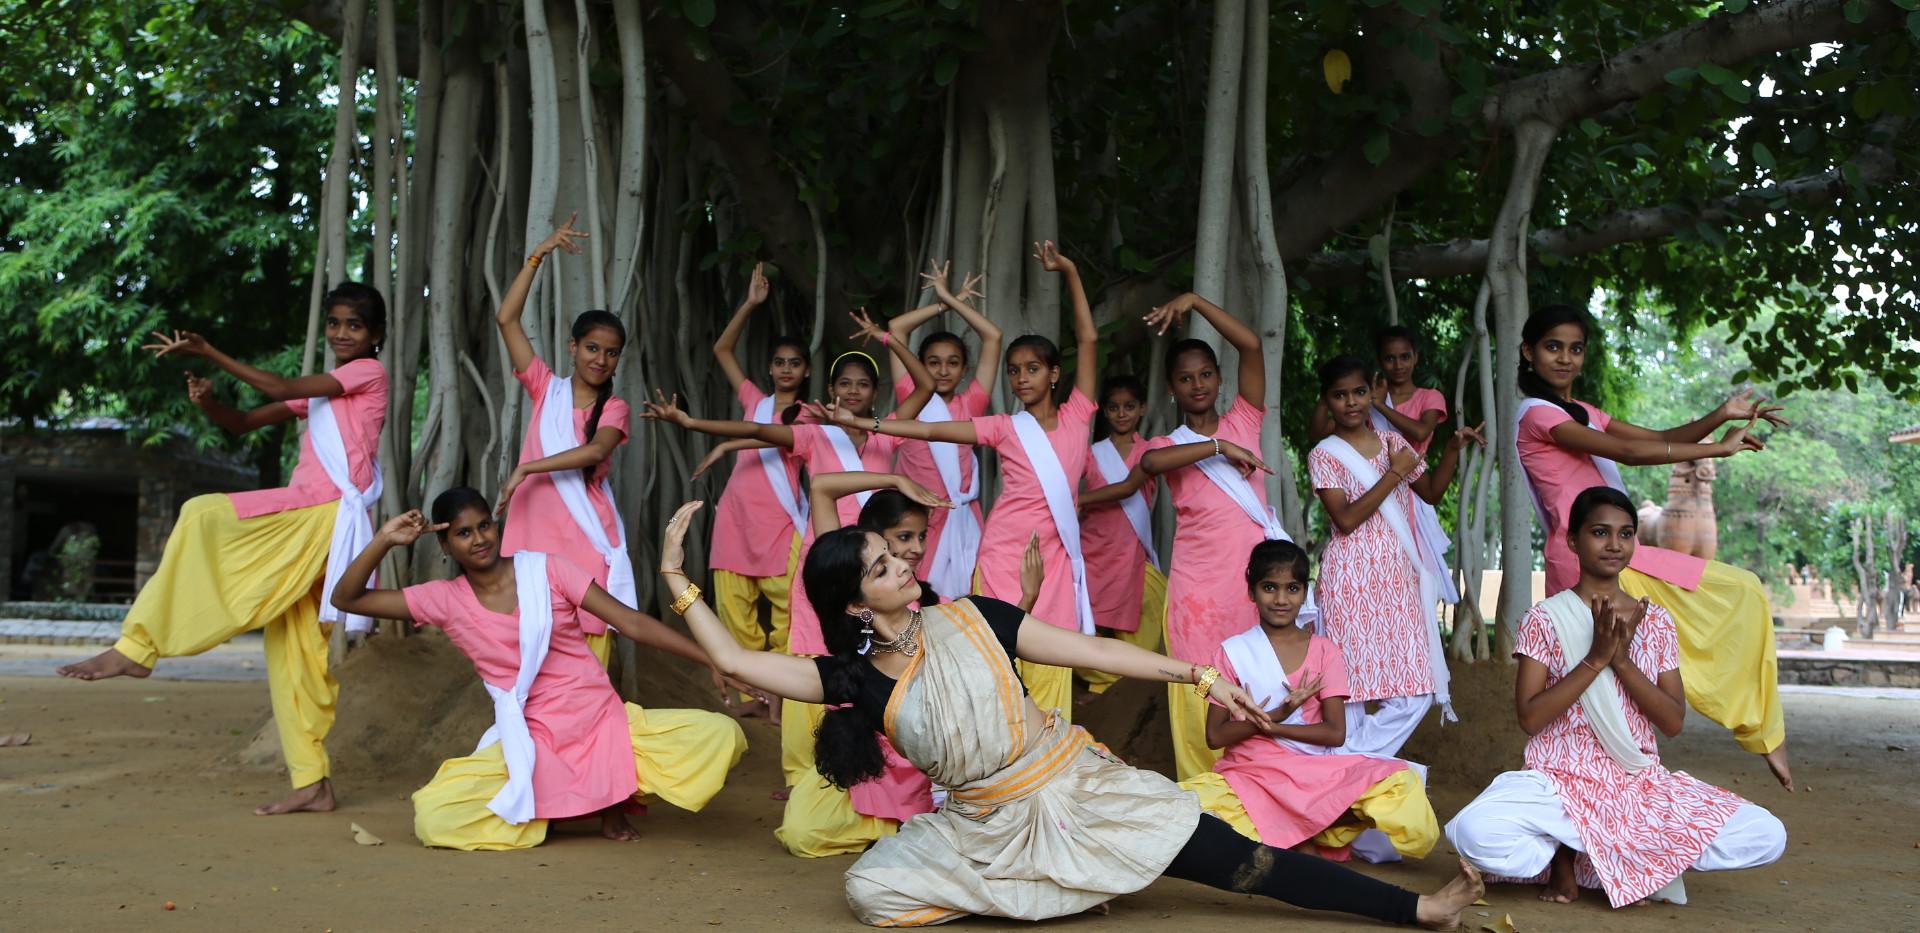 Sarvam Shakti with Founder, Nehha, under the most beautiful tree!